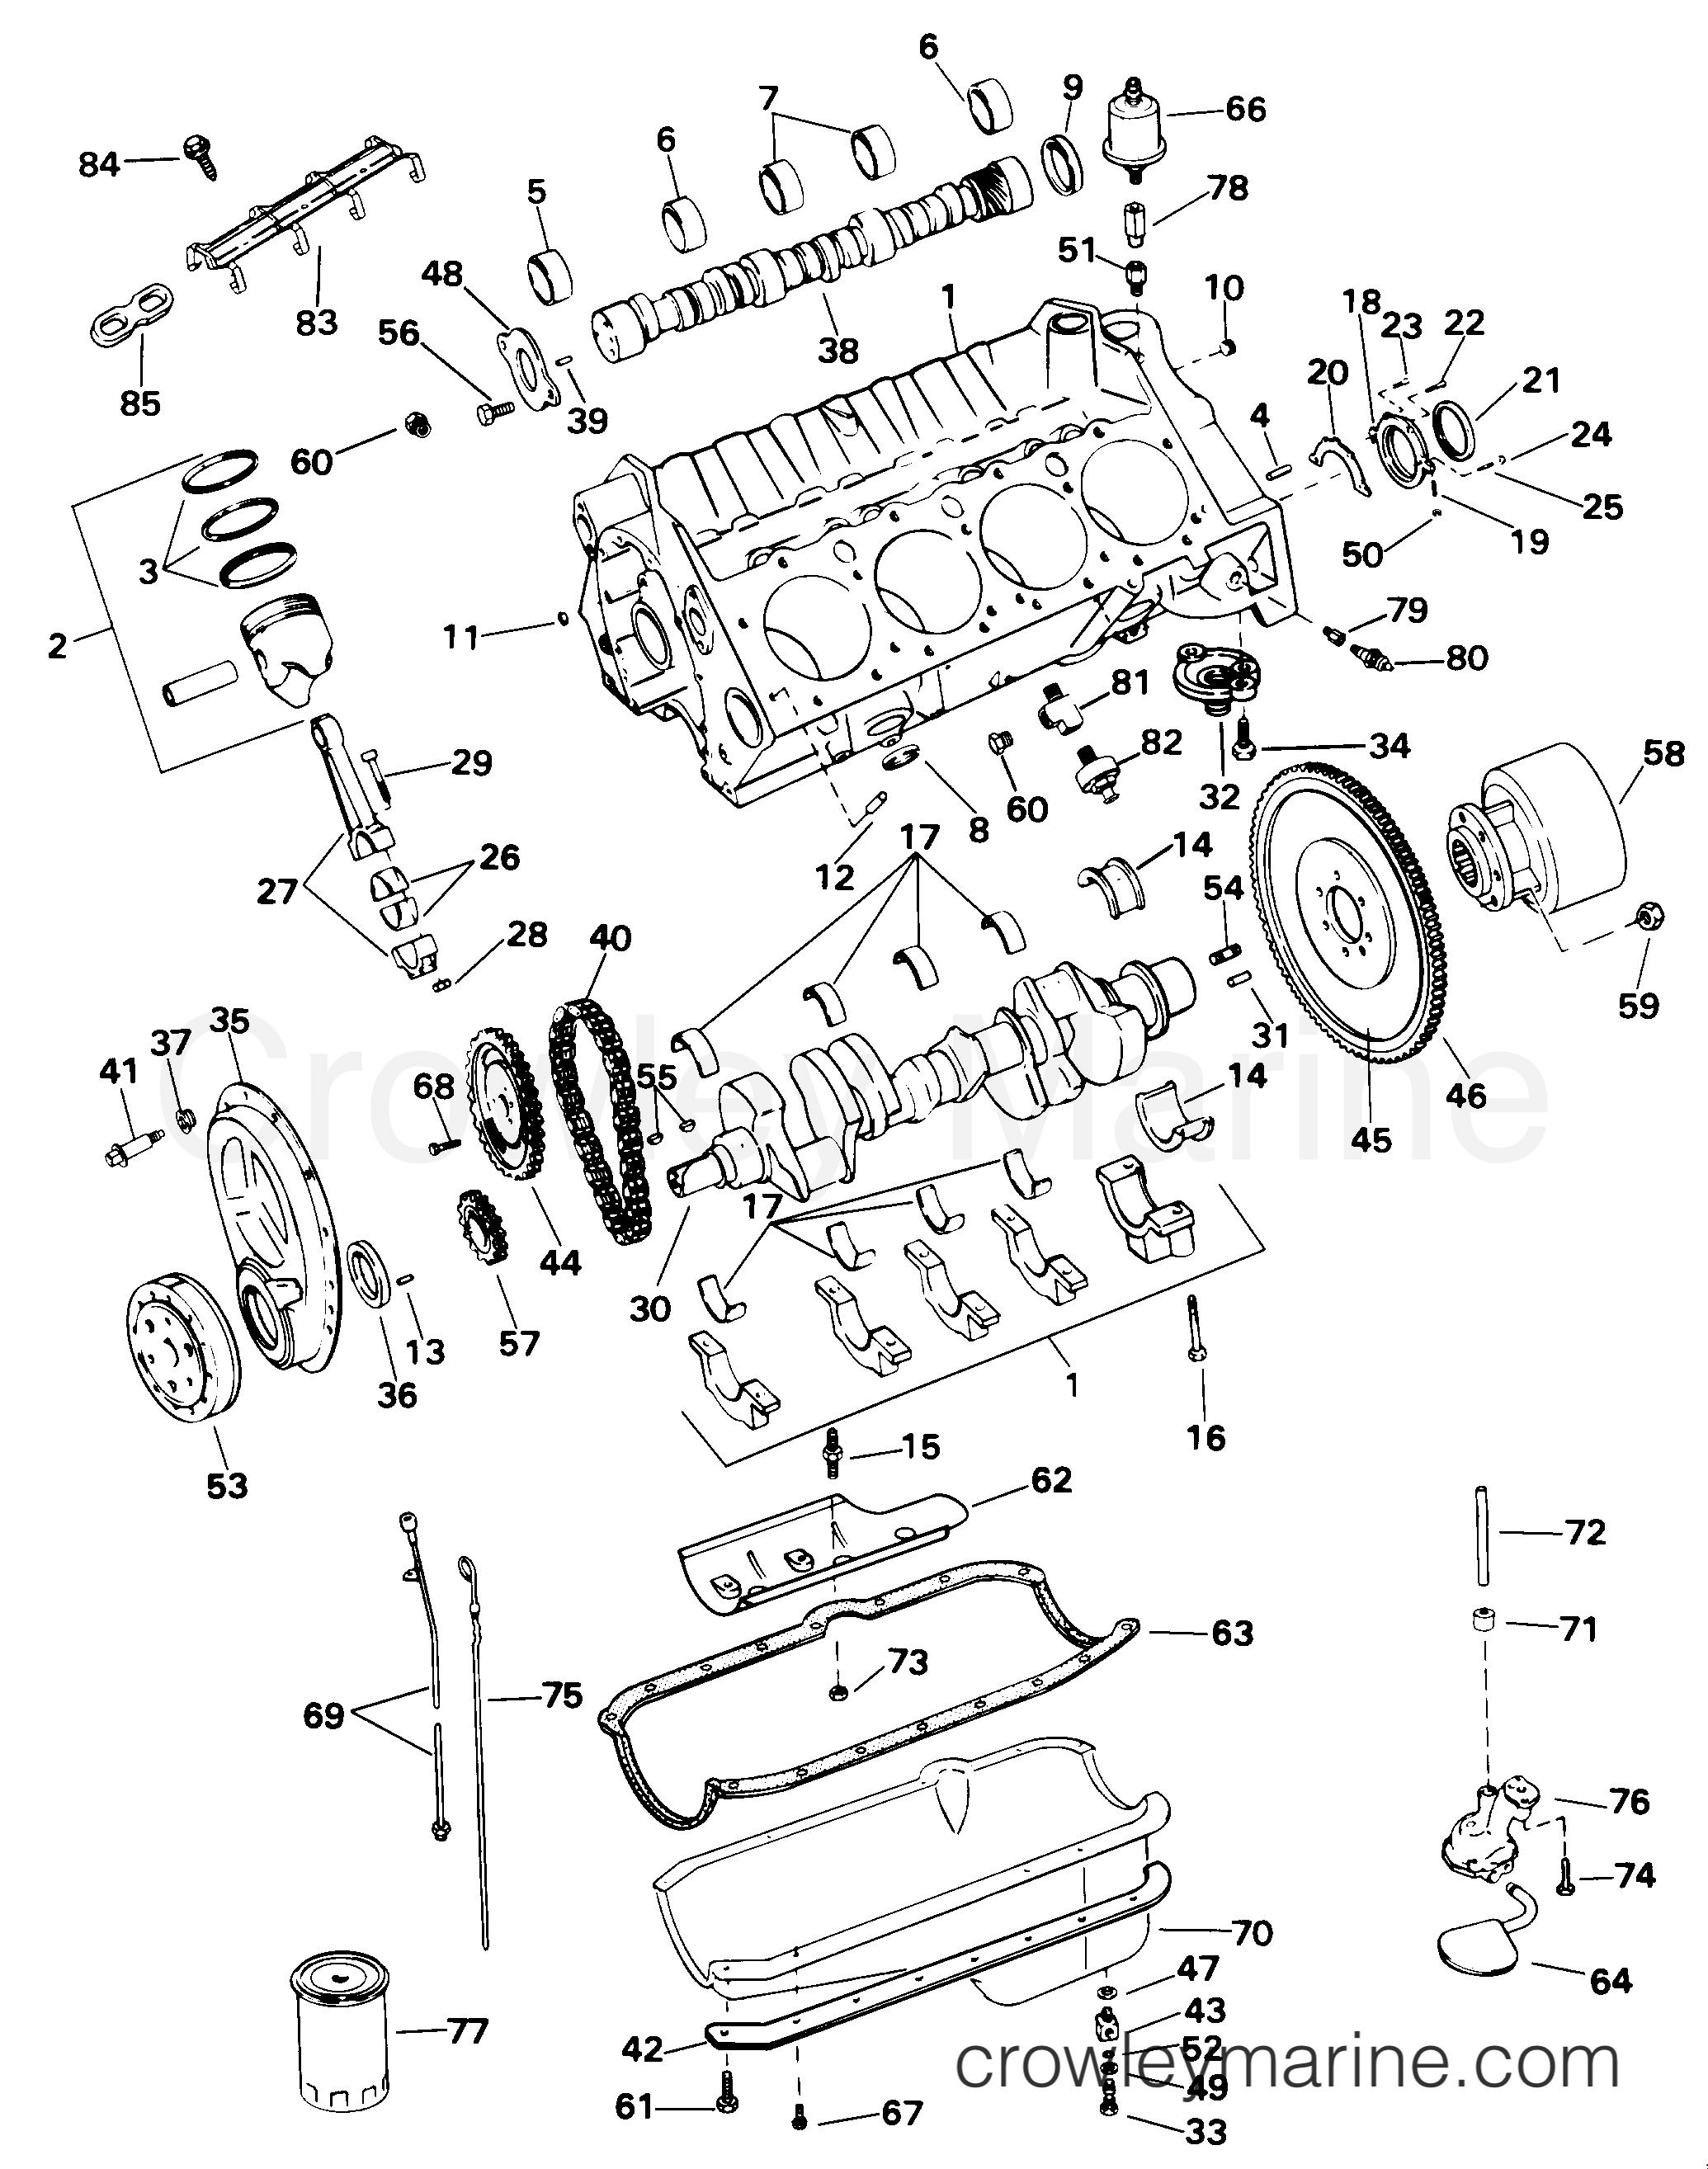 1998 OMC Stern Drive 5 - 50FBPBYC CRANKCASE section